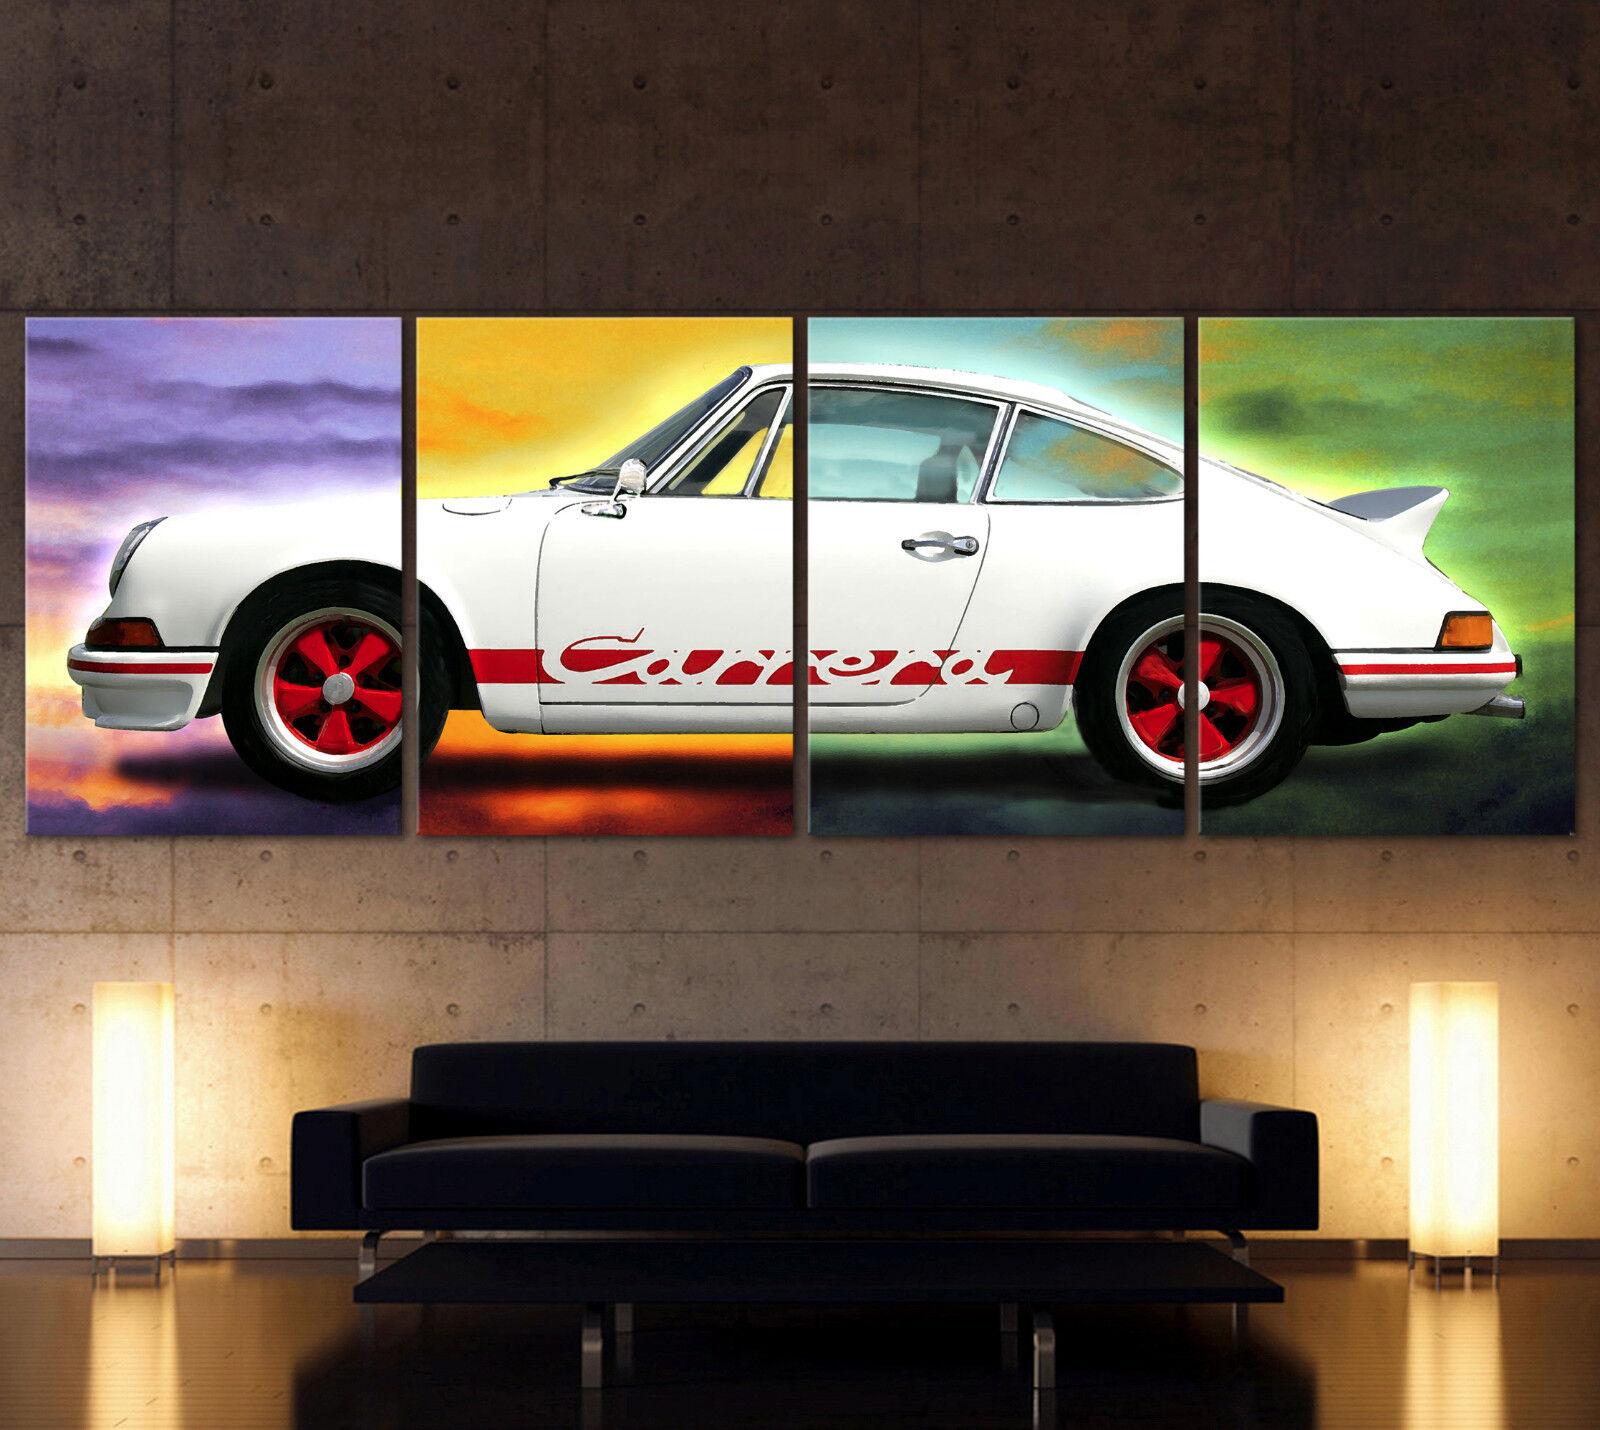 XXL Pop Art Porsche 911 Carrera Rs Immagine Tela Vintage Decorativa Classico